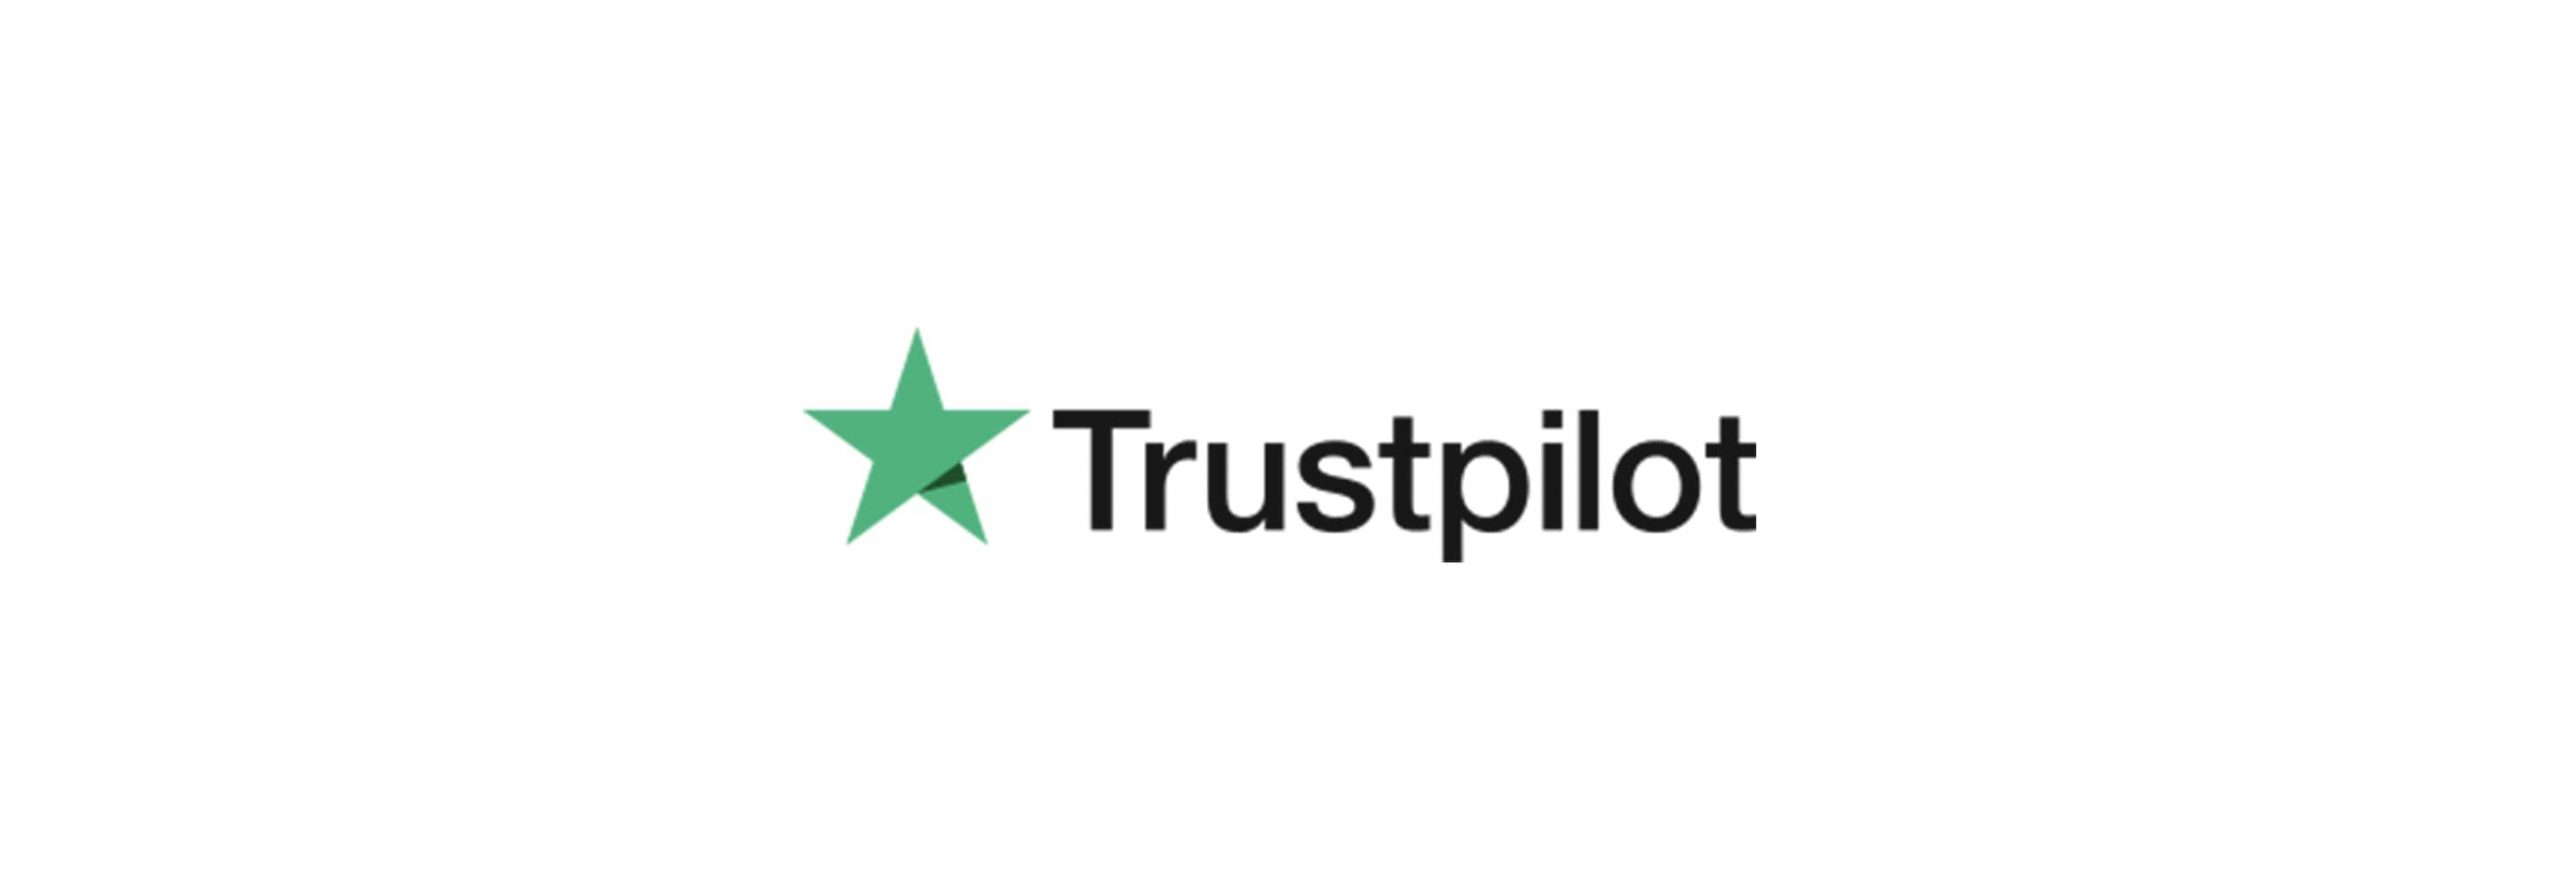 trustpilot-min